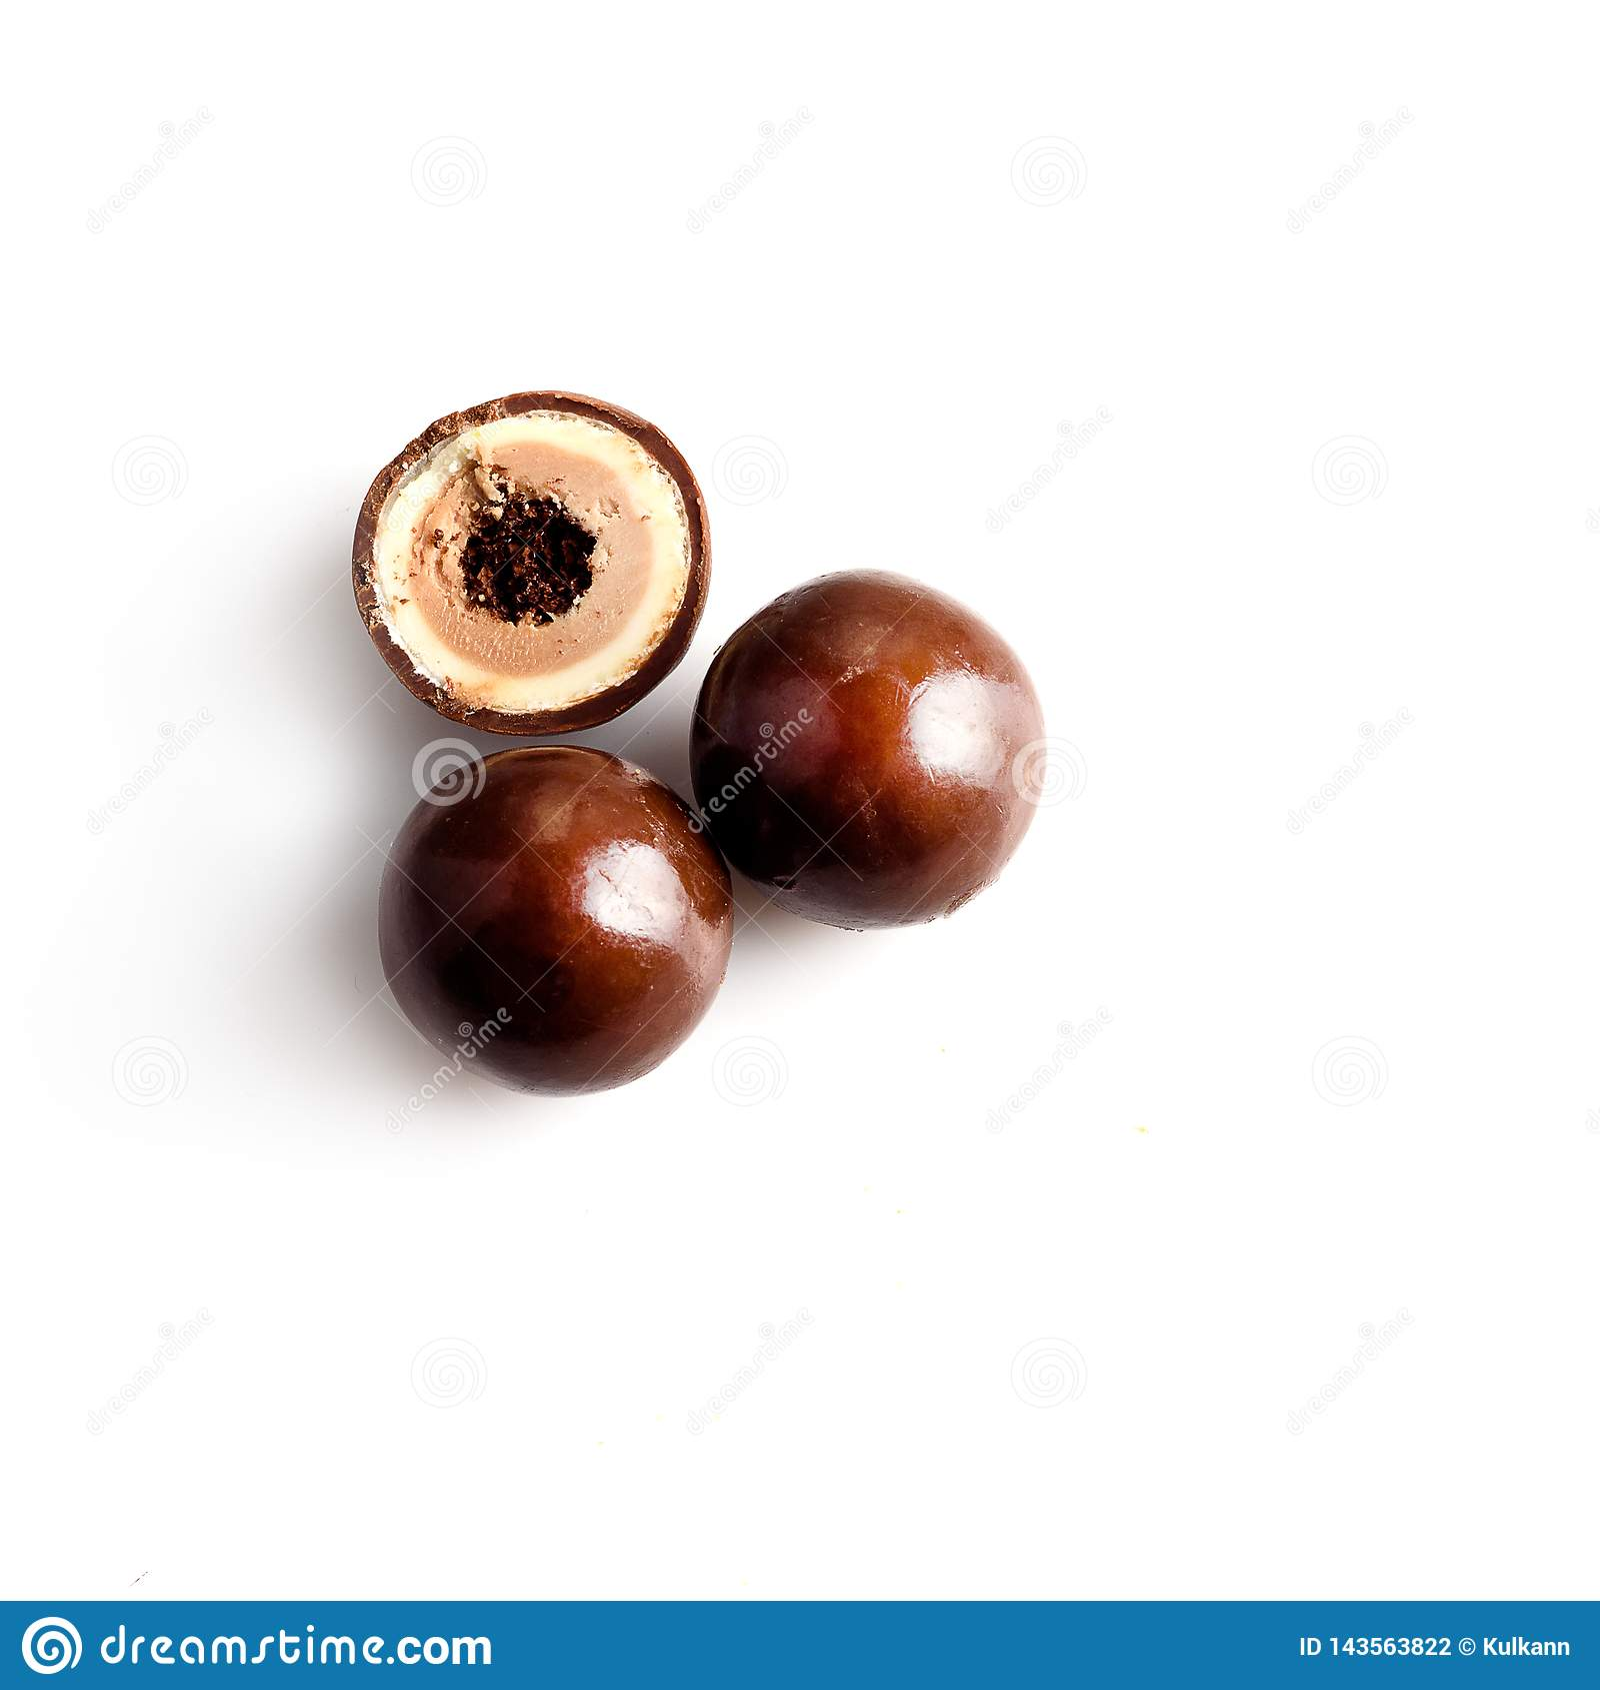 Chocolates on a white background, three pieces